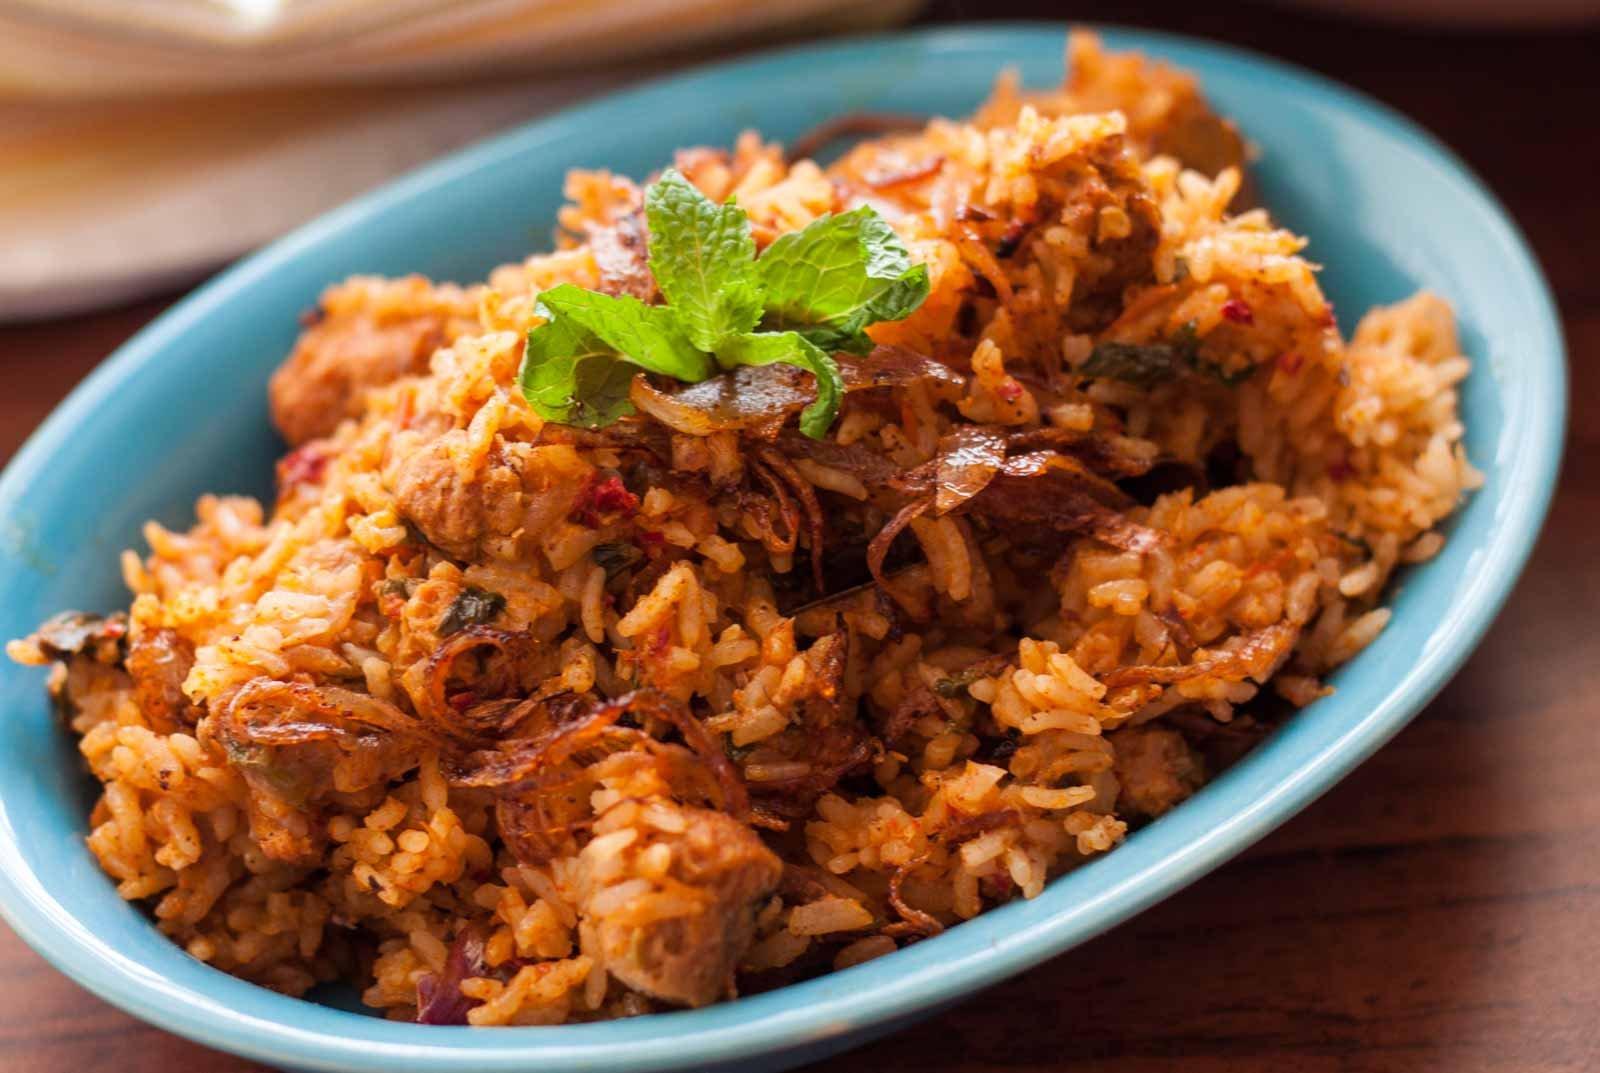 Andhra style vegetarian biryani with soya chunks recipe by andhra style vegetarian biryani with soya chunks recipe forumfinder Images